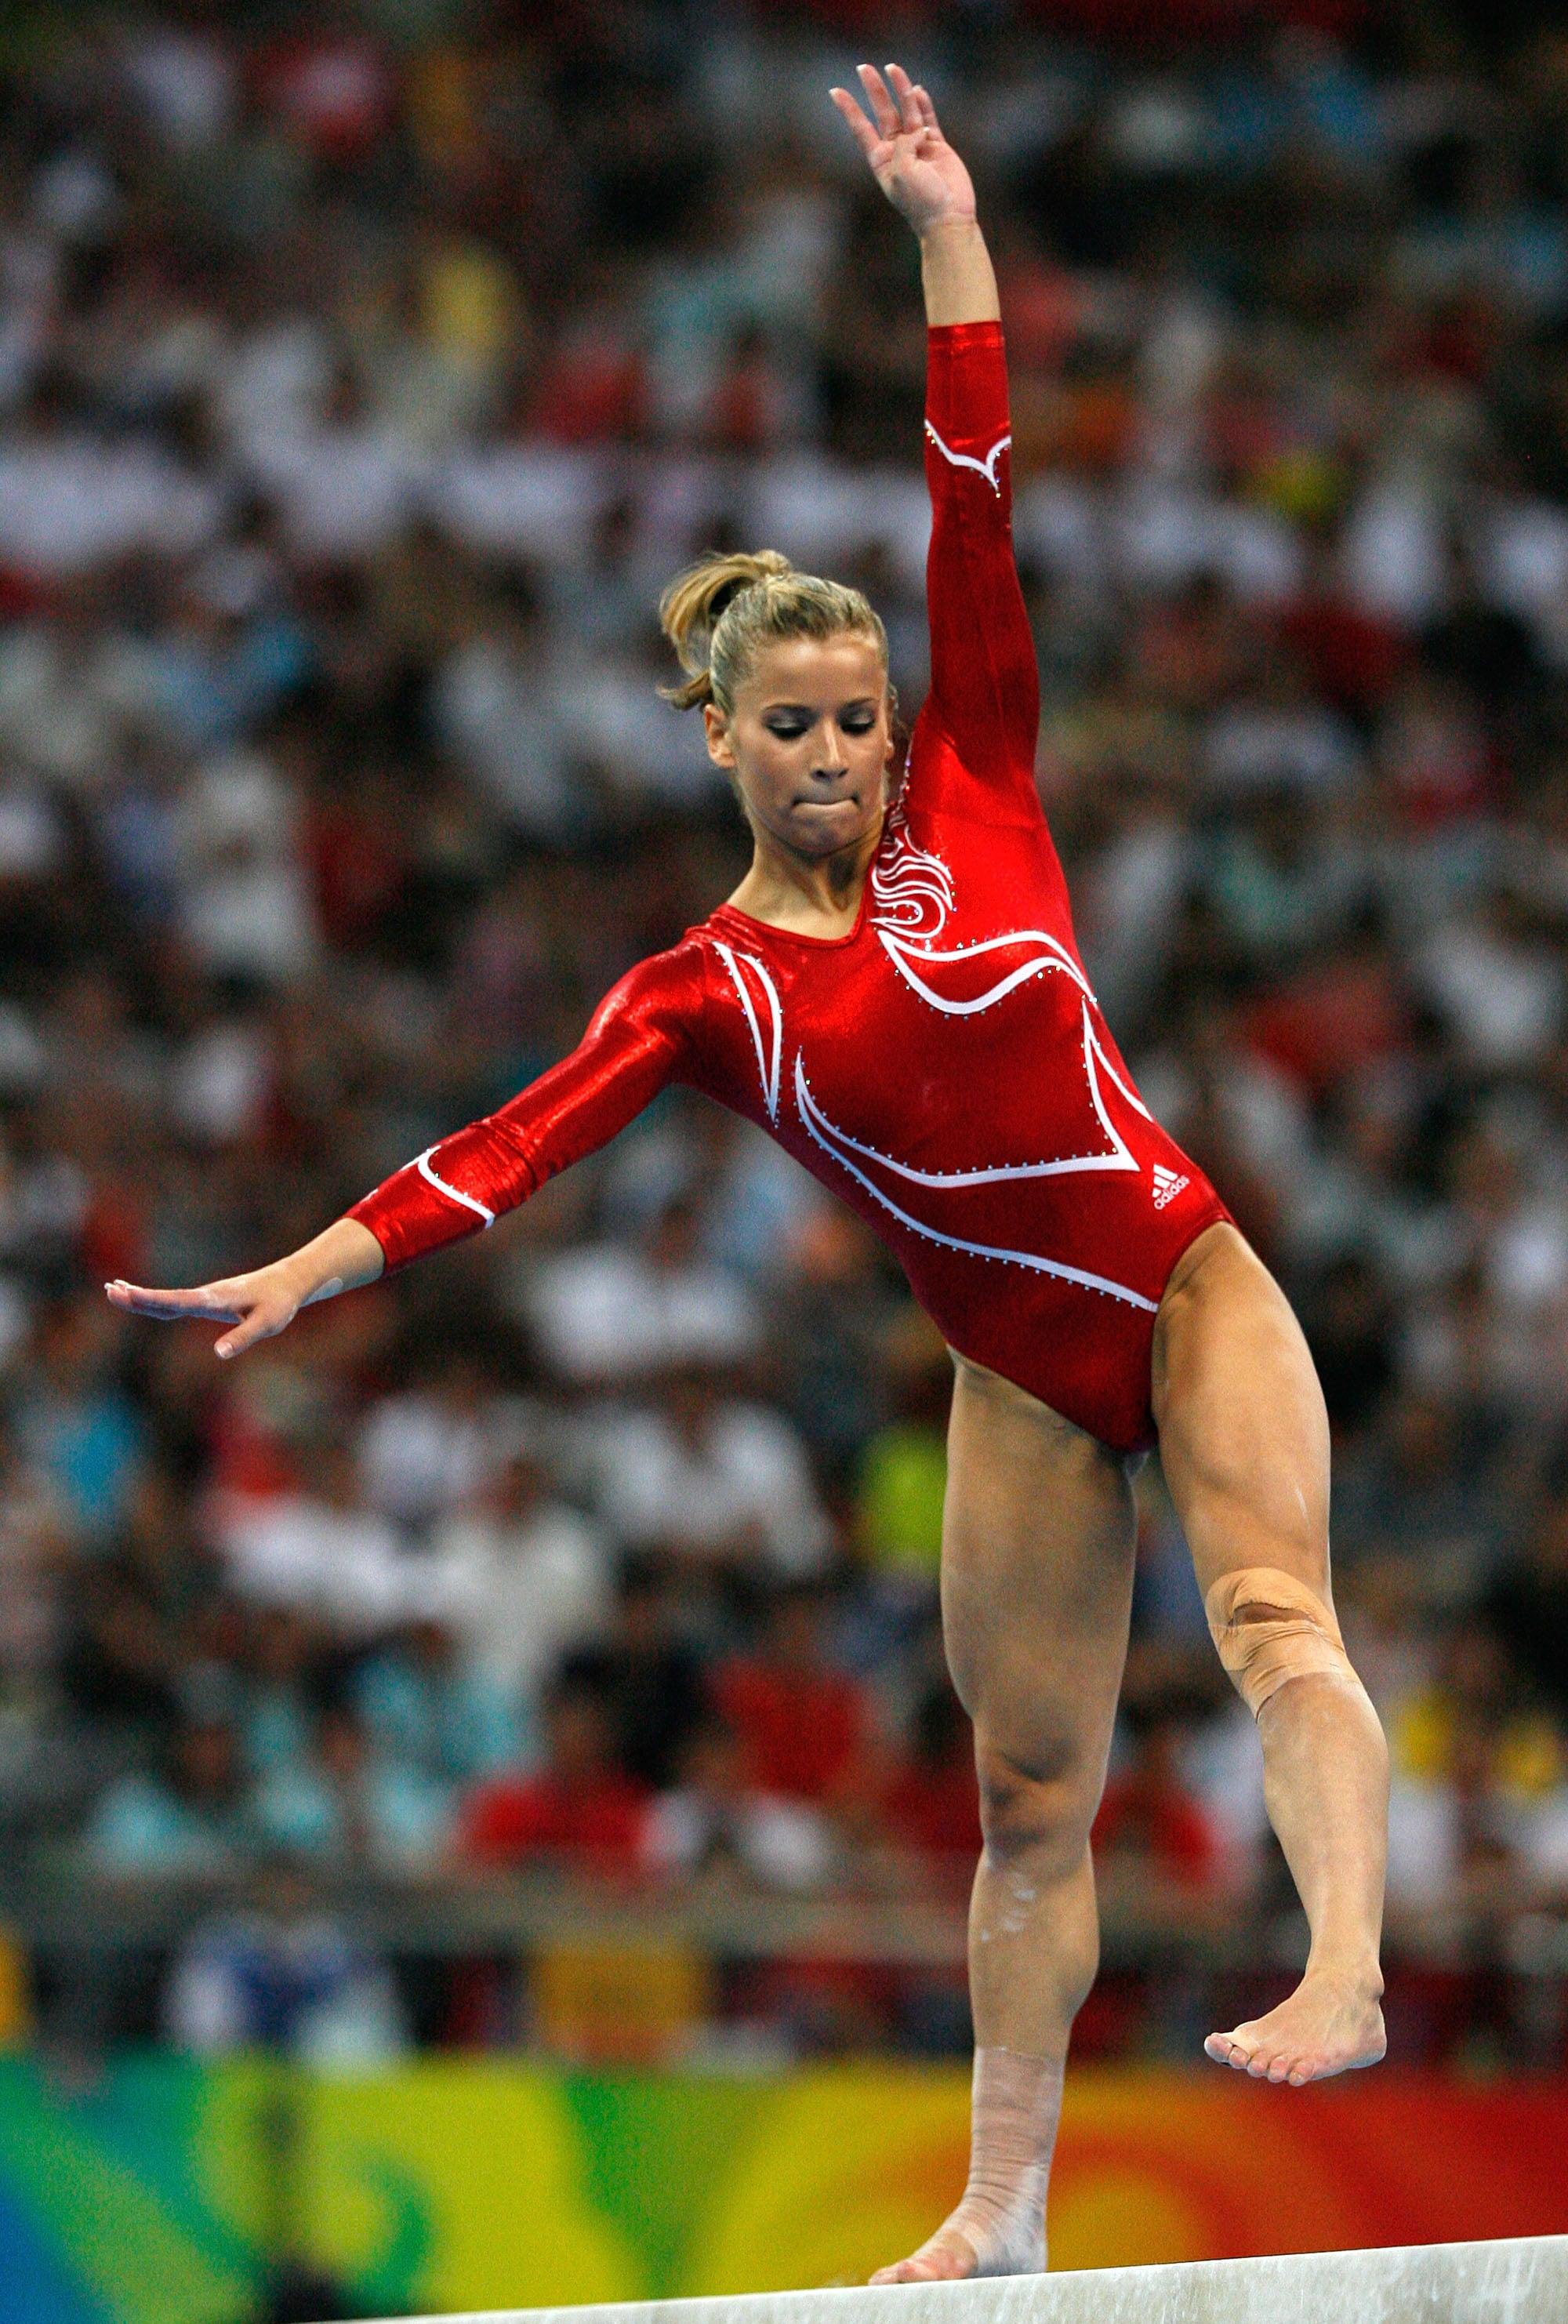 Alicia Sacramone loses her balance on the beam.